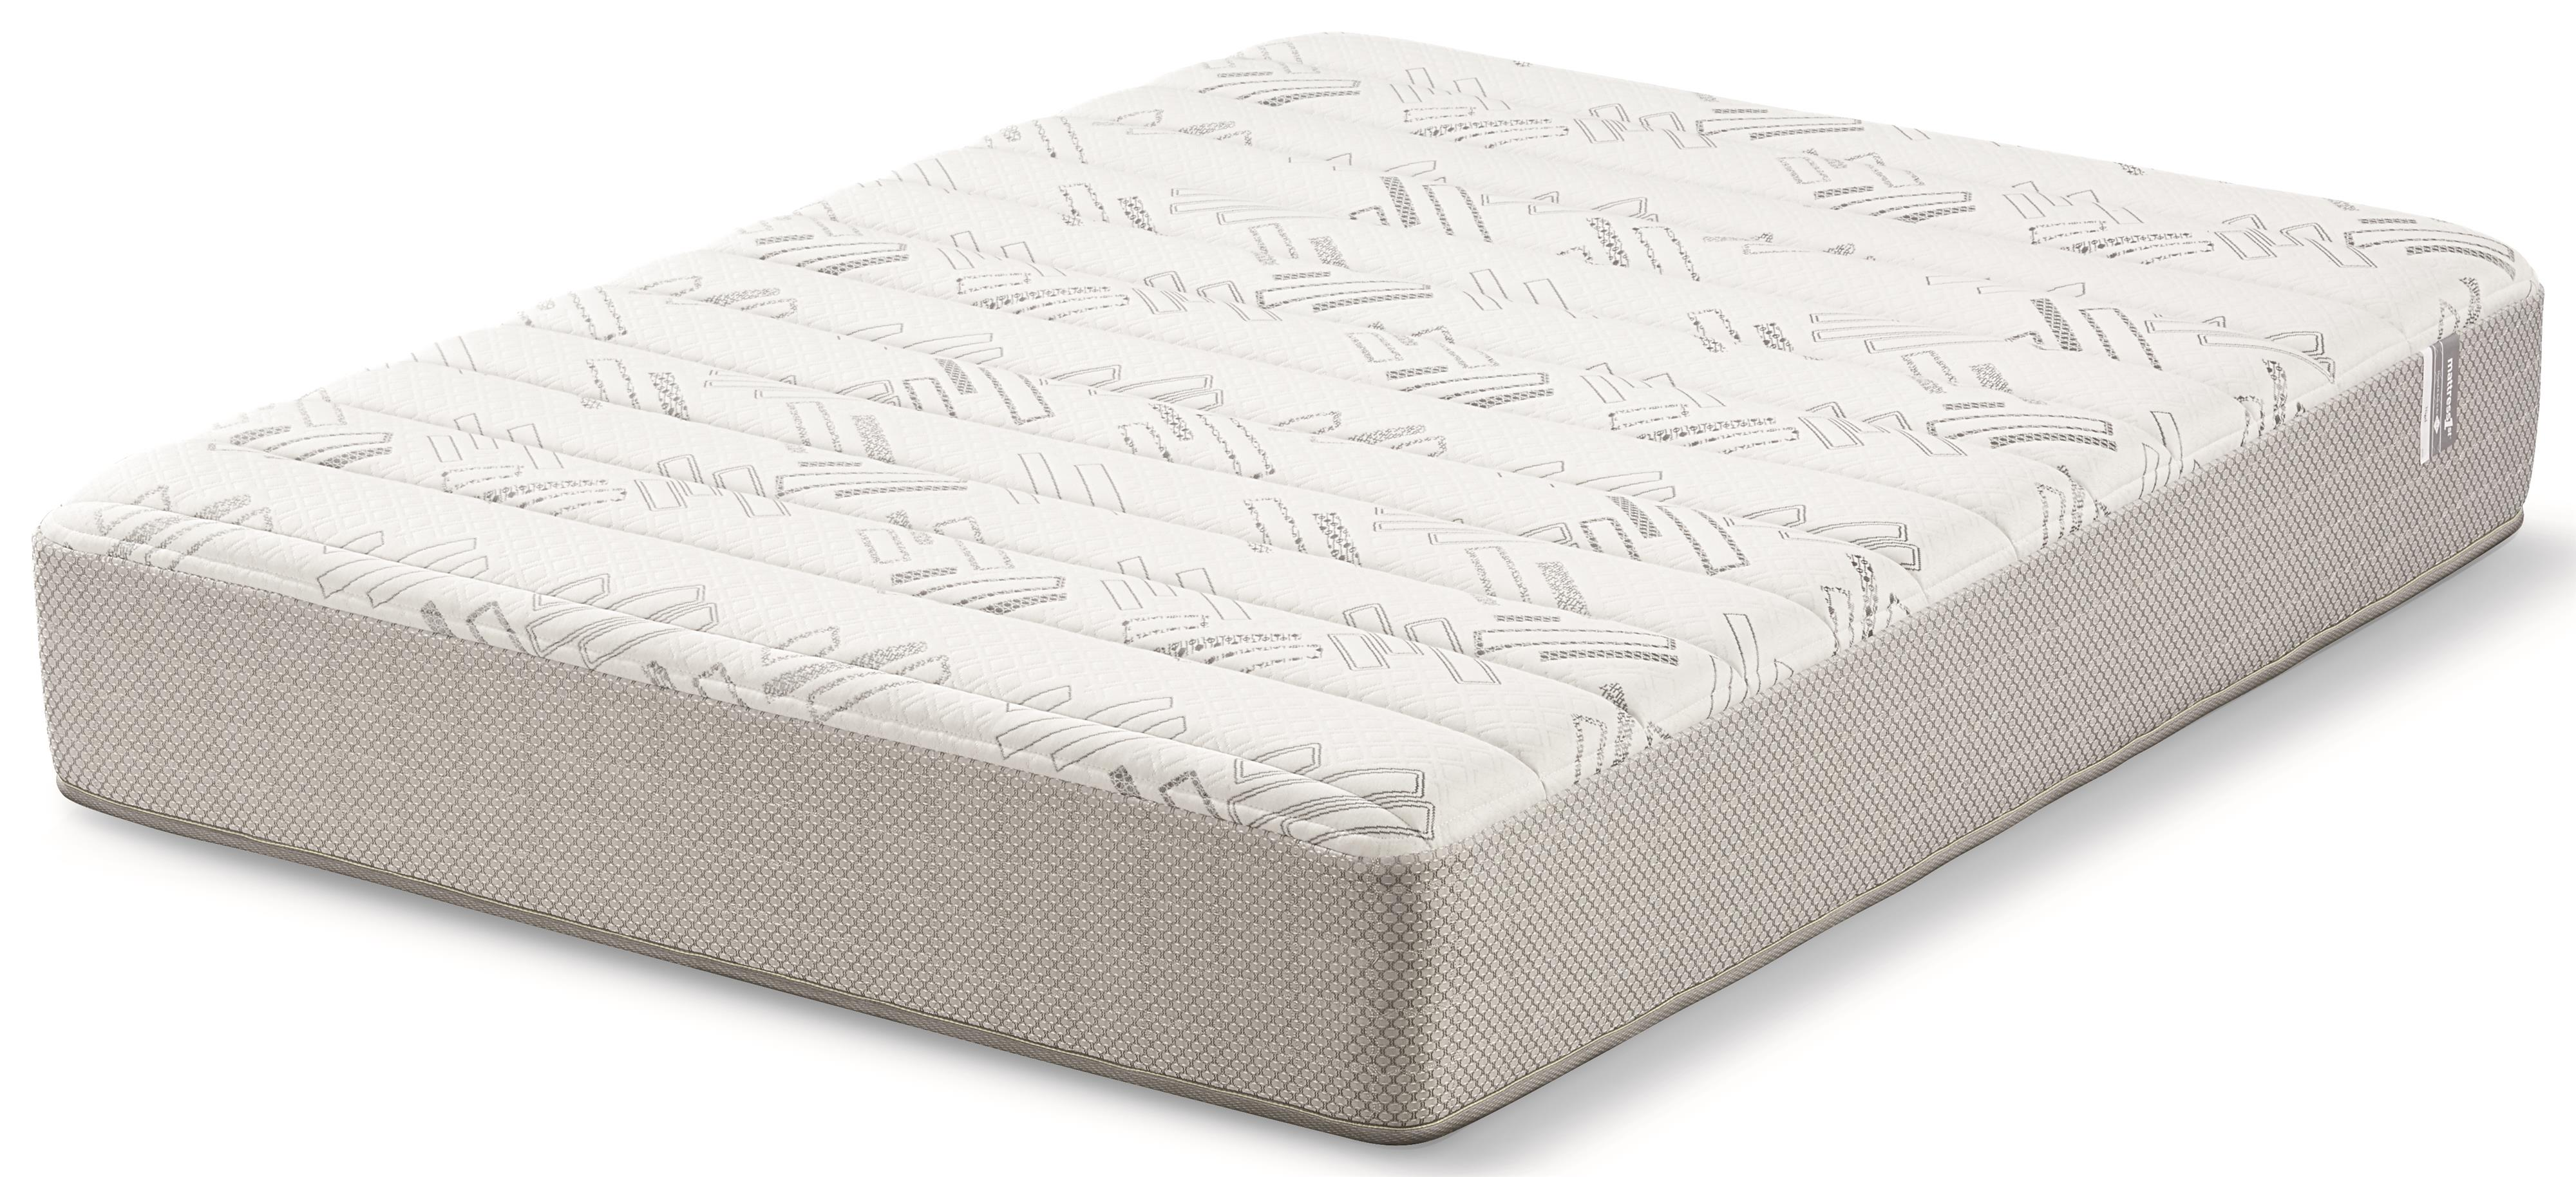 Mattress 1st Nigel Queen Plush Memory Foam Mattress - Item Number: 500955742-Q